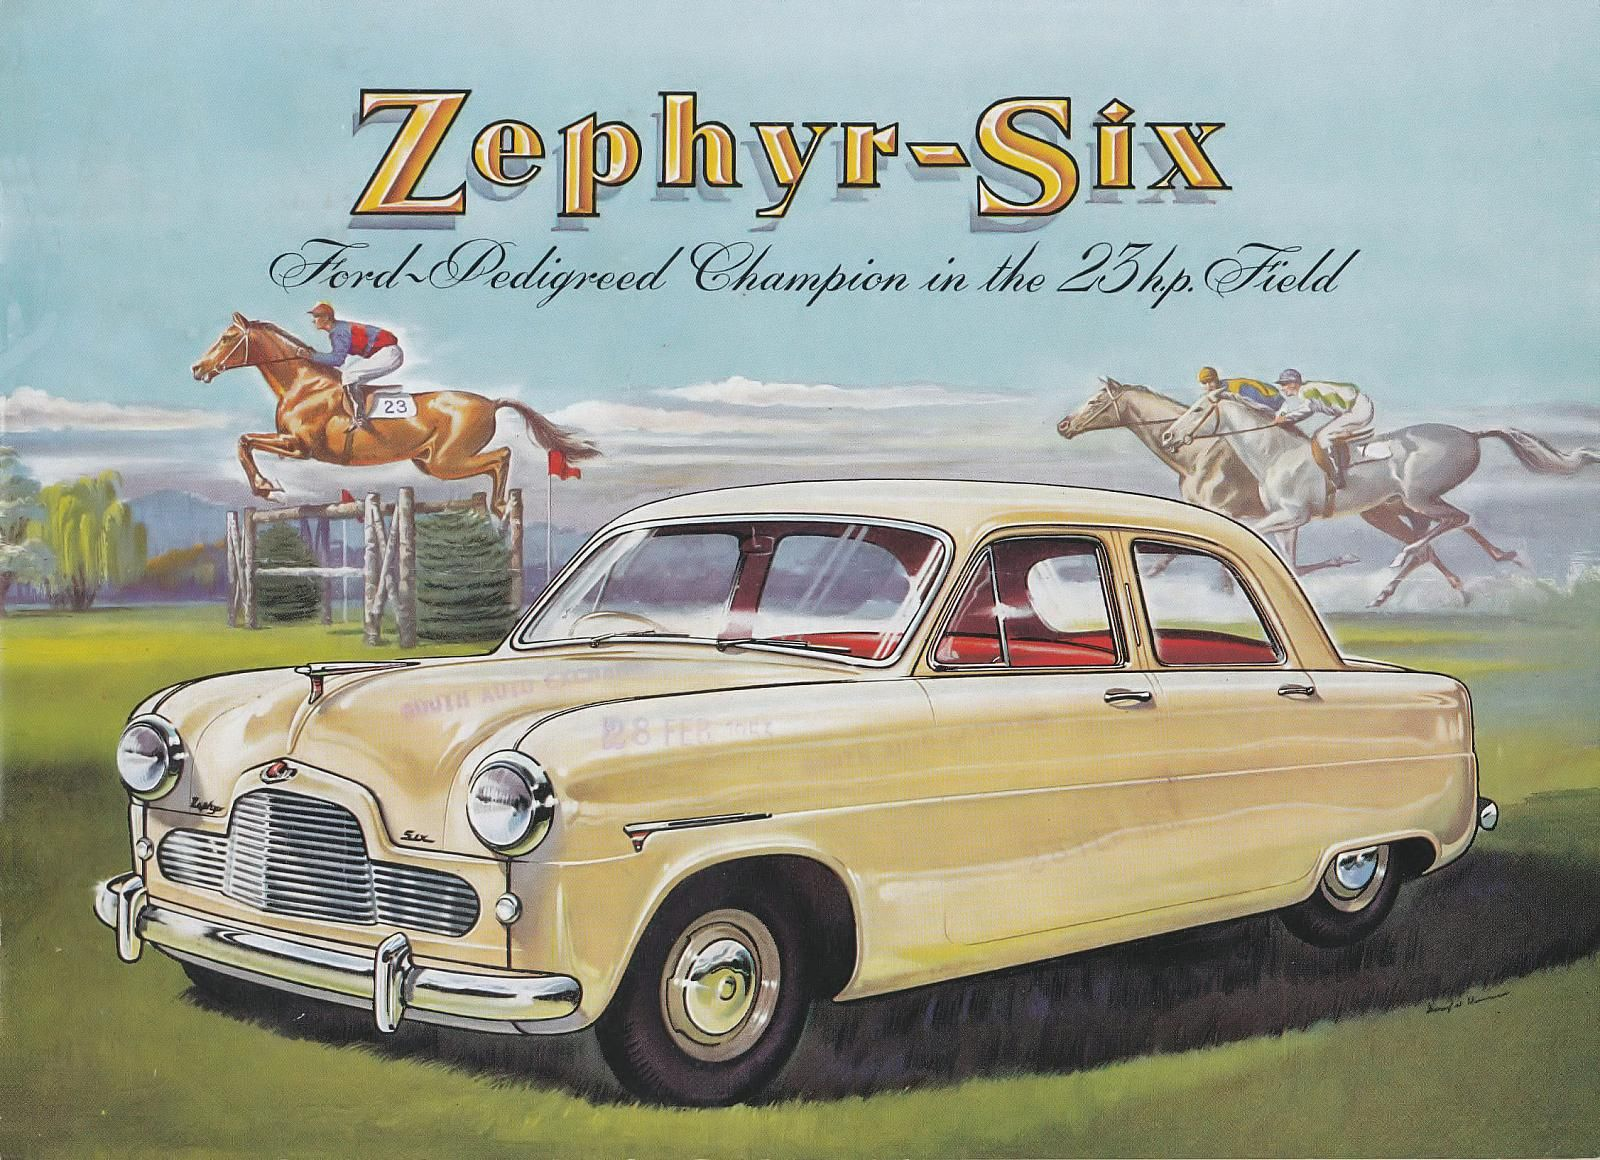 1951 Ford Zephyr Six Brochure Aus Ford Zephyr Retro Cars Ford